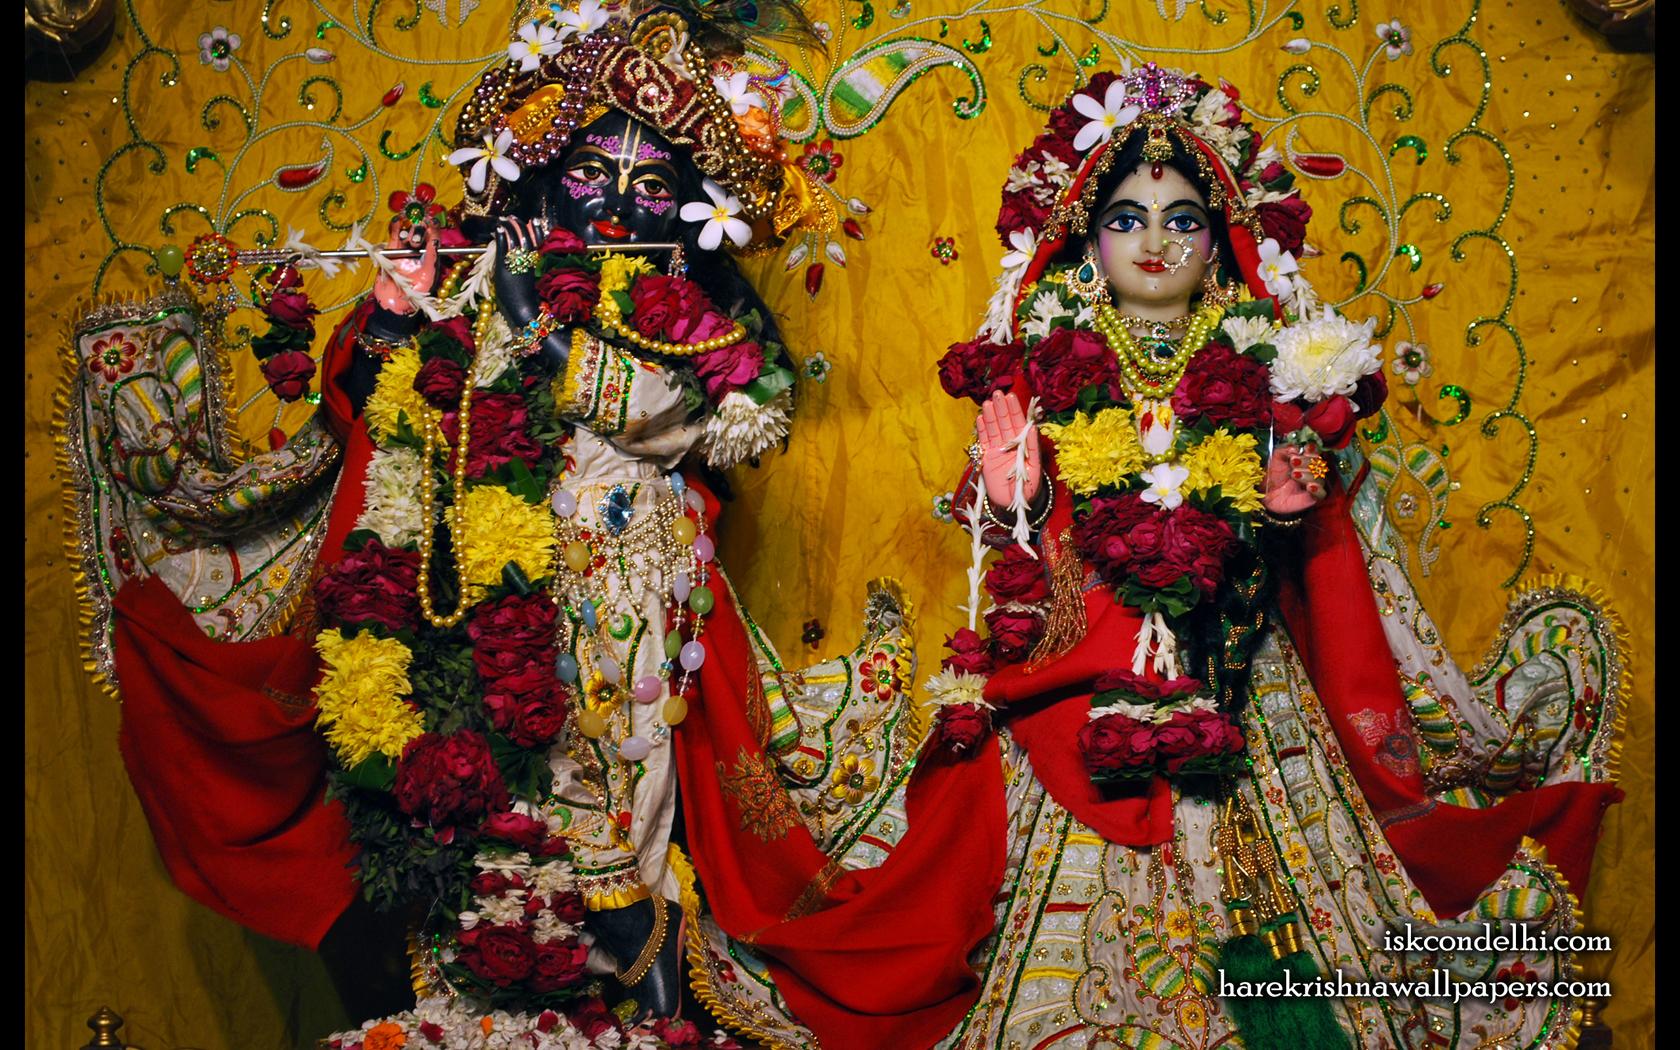 Sri Sri Radha Parthasarathi Wallpaper (004) Size 1680x1050 Download